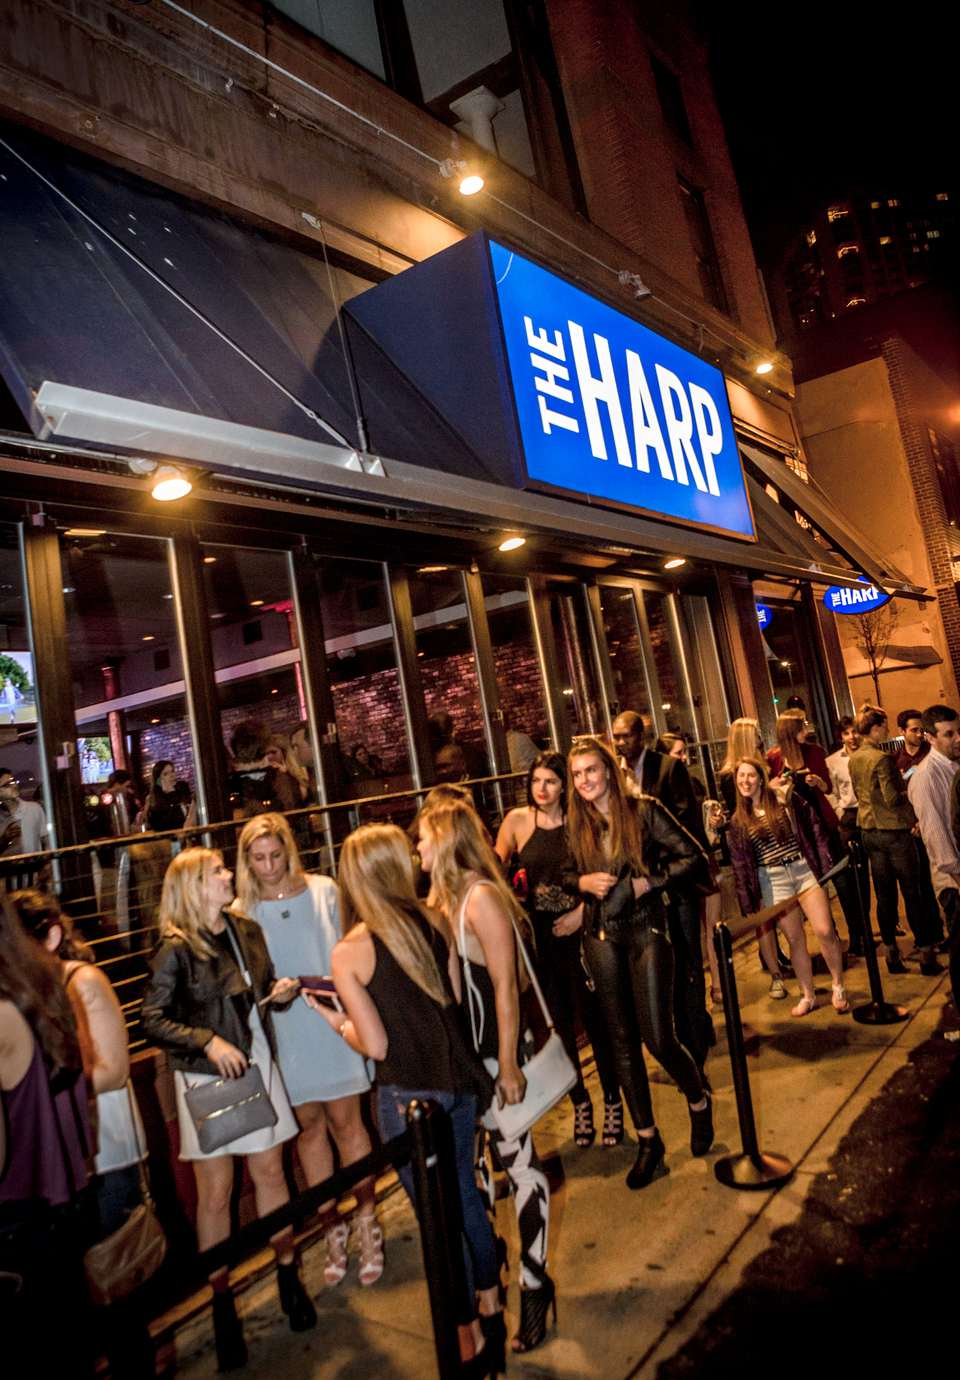 Best Boston Bars Near the TD Garden